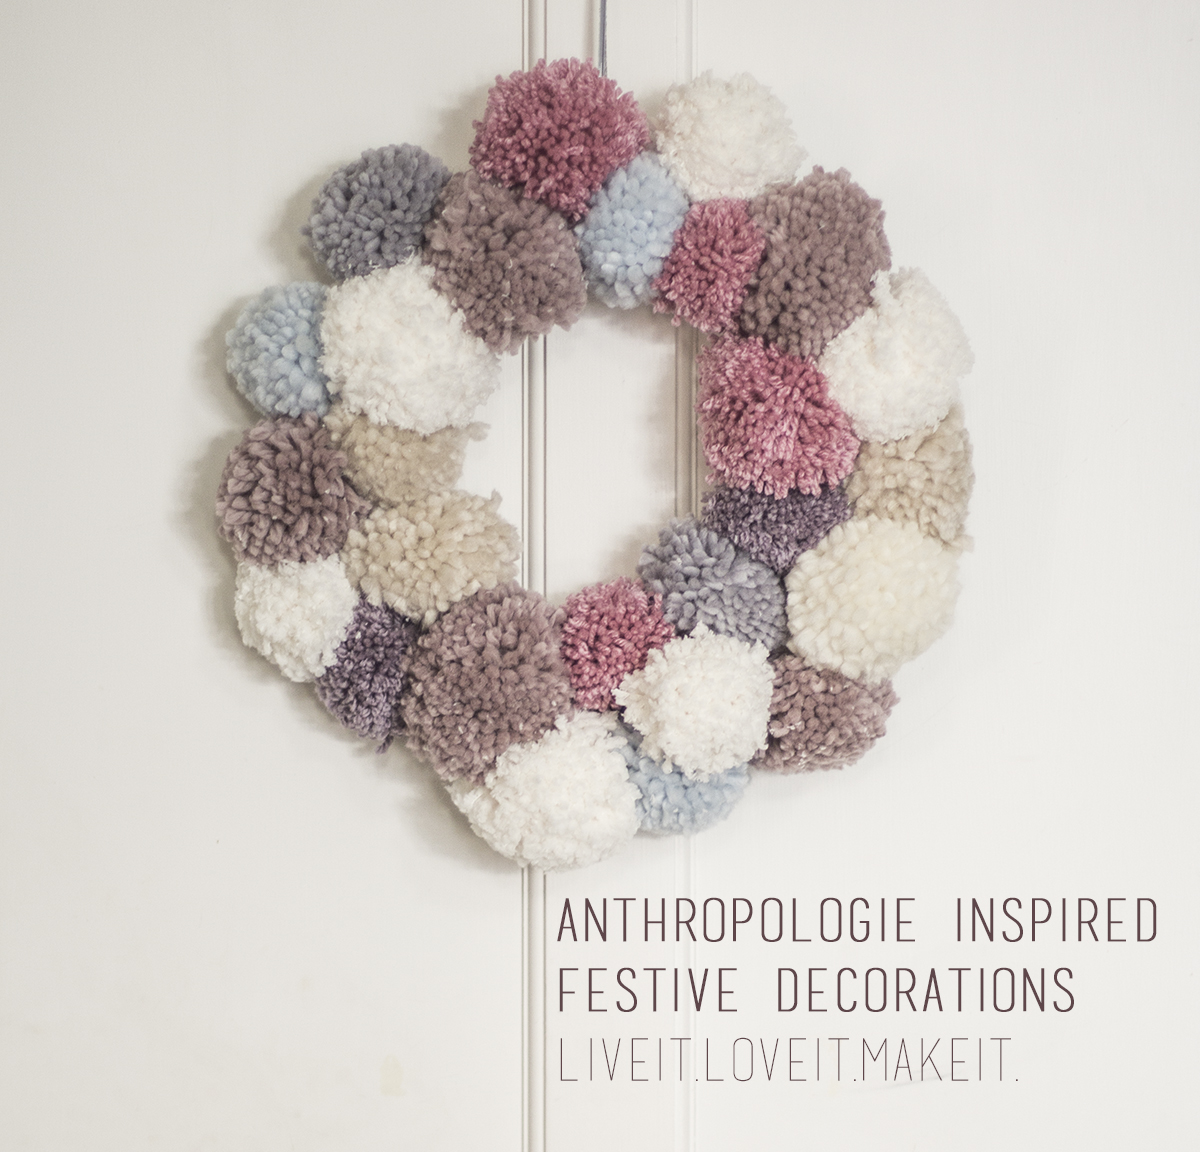 Live it . Love it . Make it.: Make it: Anthropologie Inspired ...